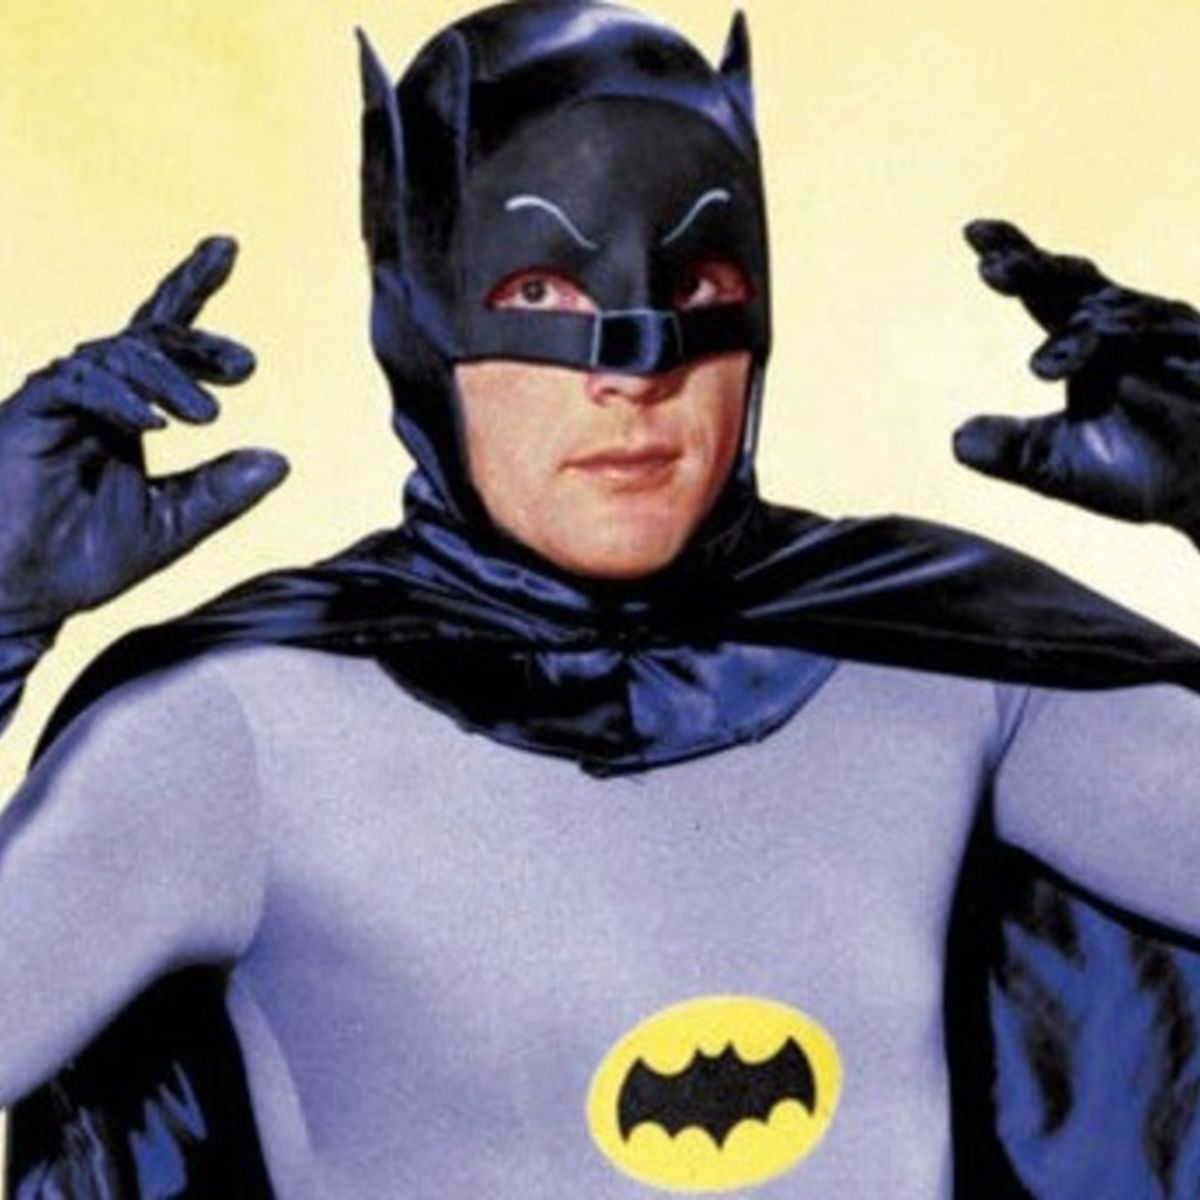 adam-west-batman.jpg